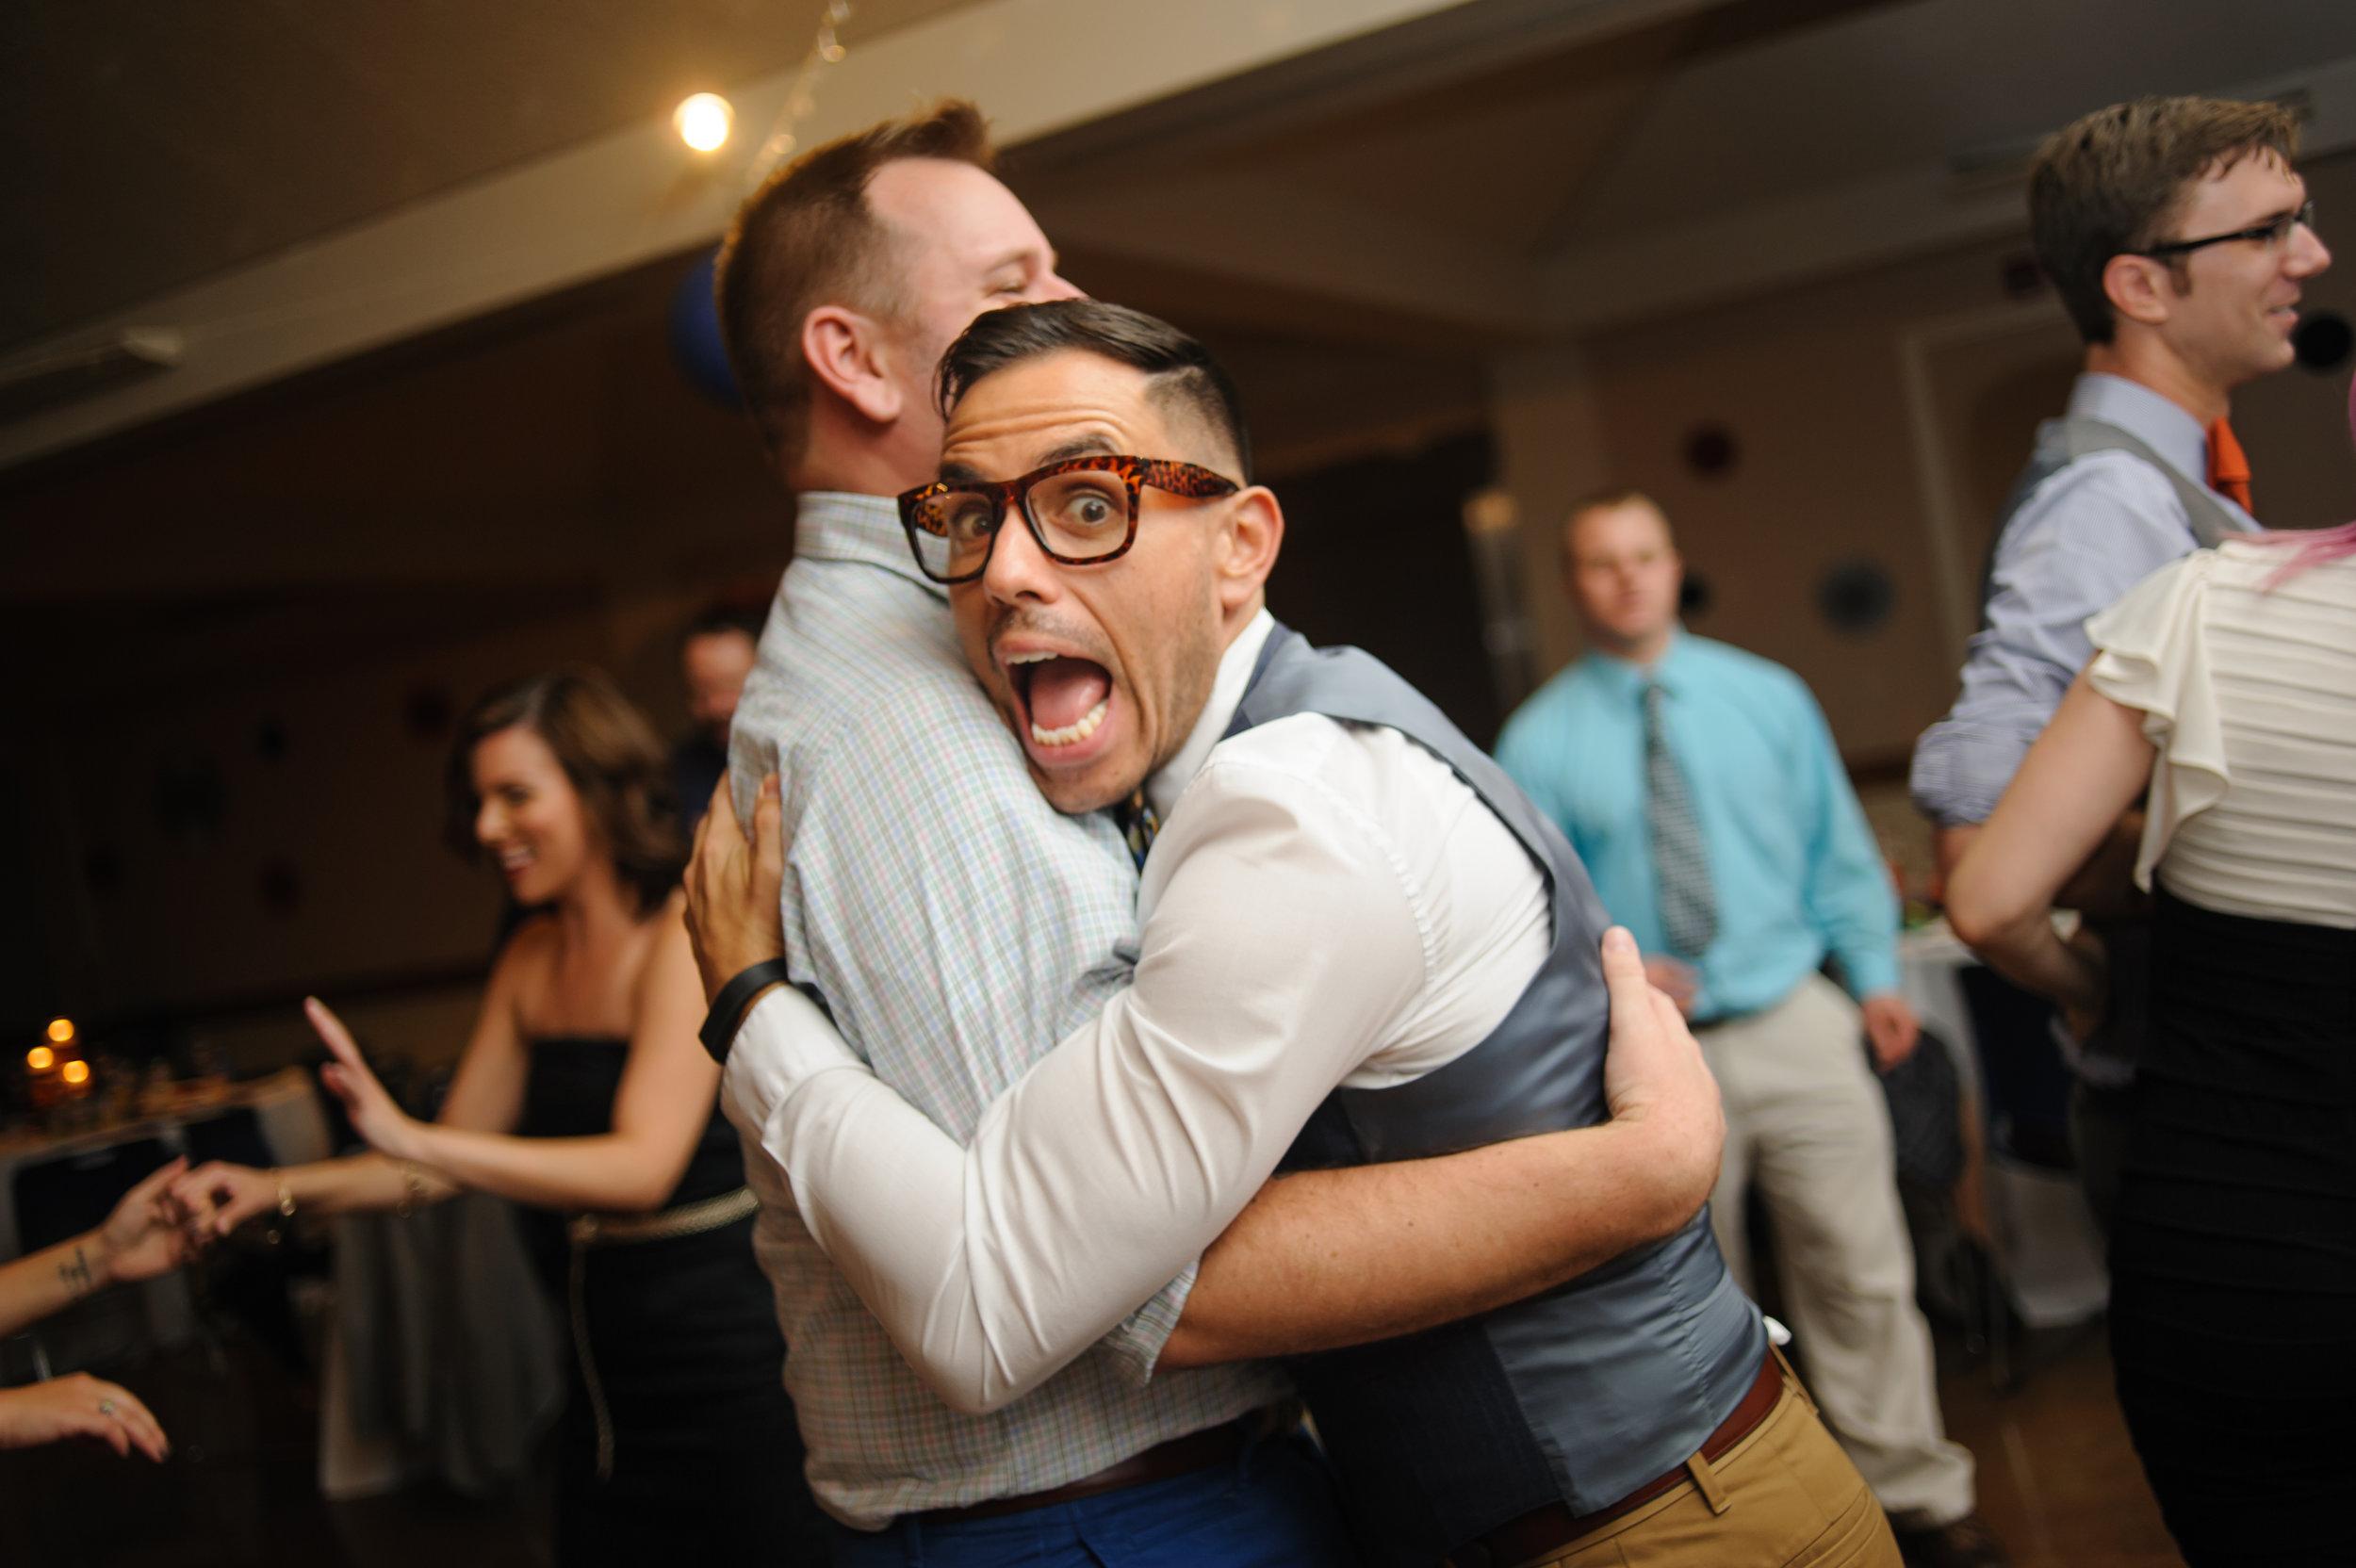 josh-parker-049-same-sex-sacramento-wedding-photographer-katherine-nicole-photography.JPG